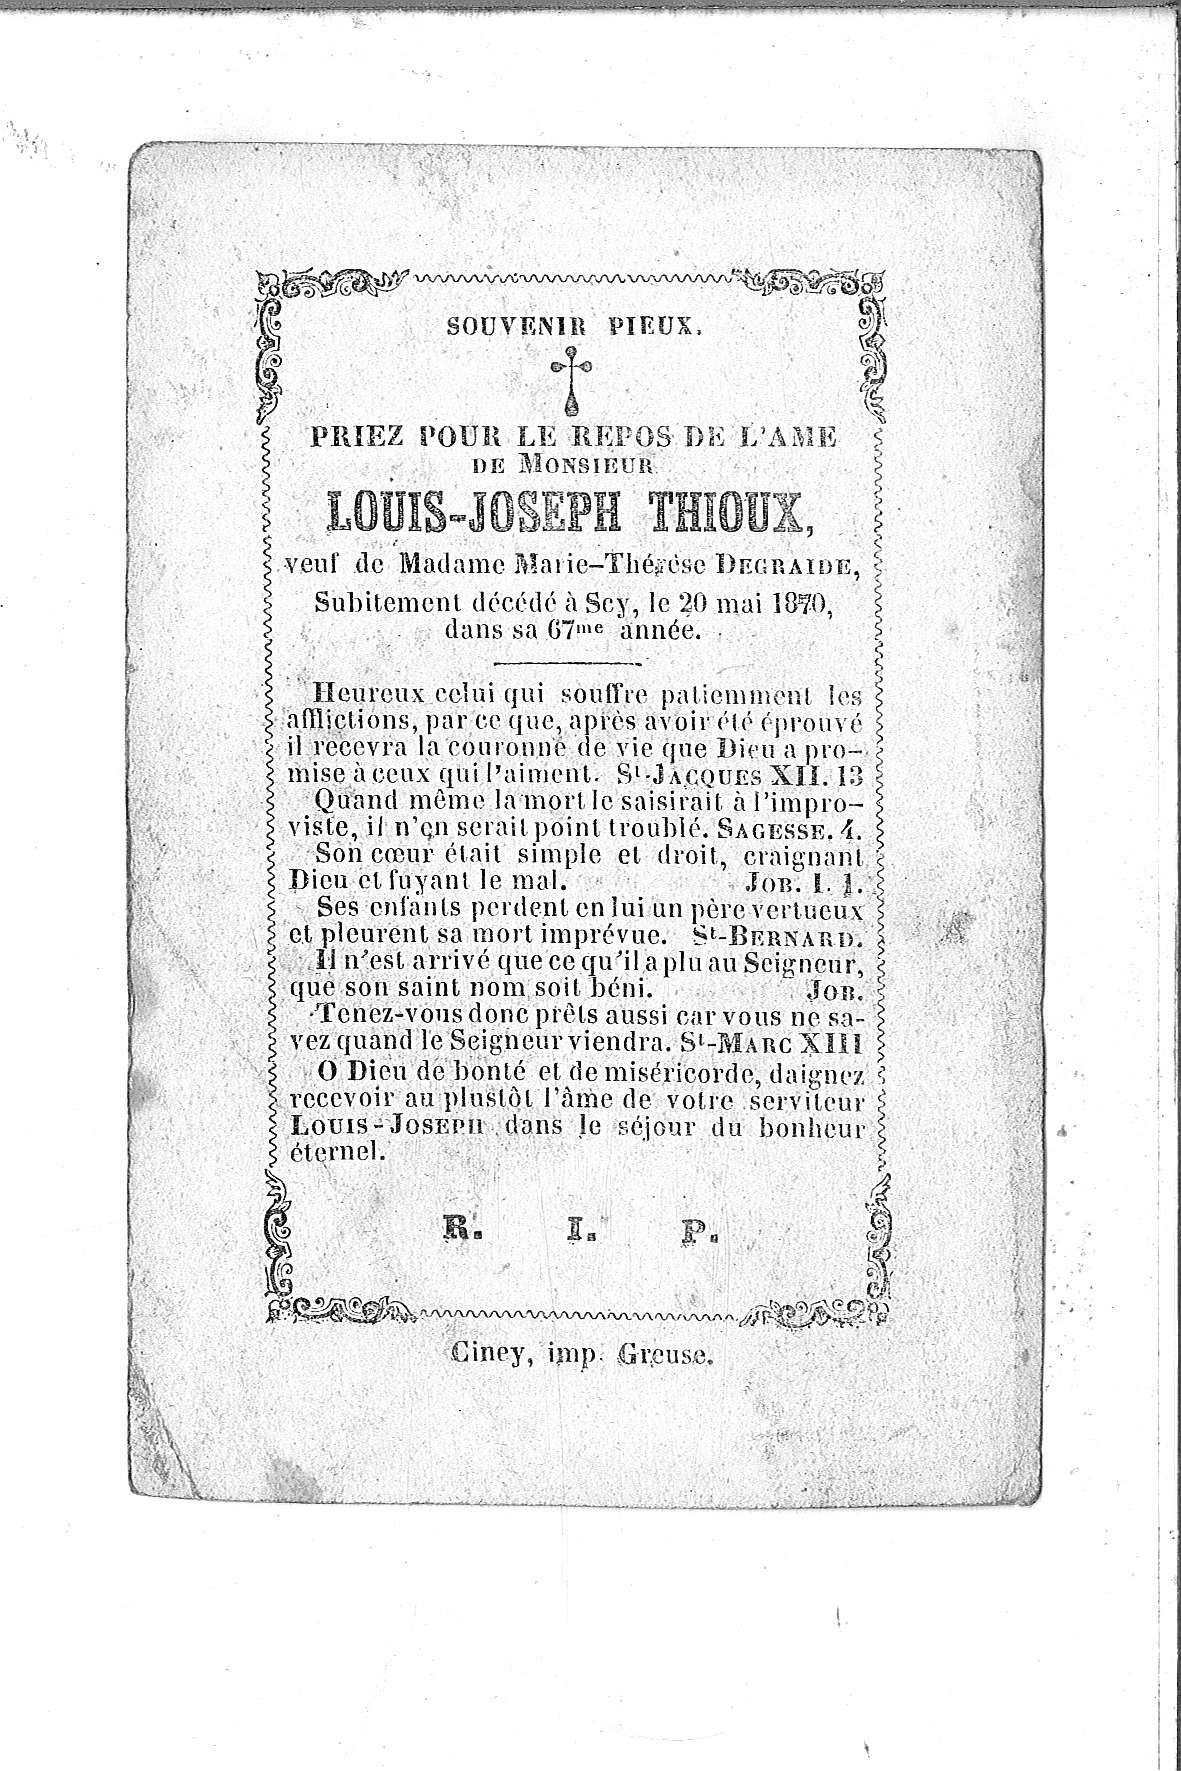 Louis-Joseph(1870)20140825083222_00149.jpg